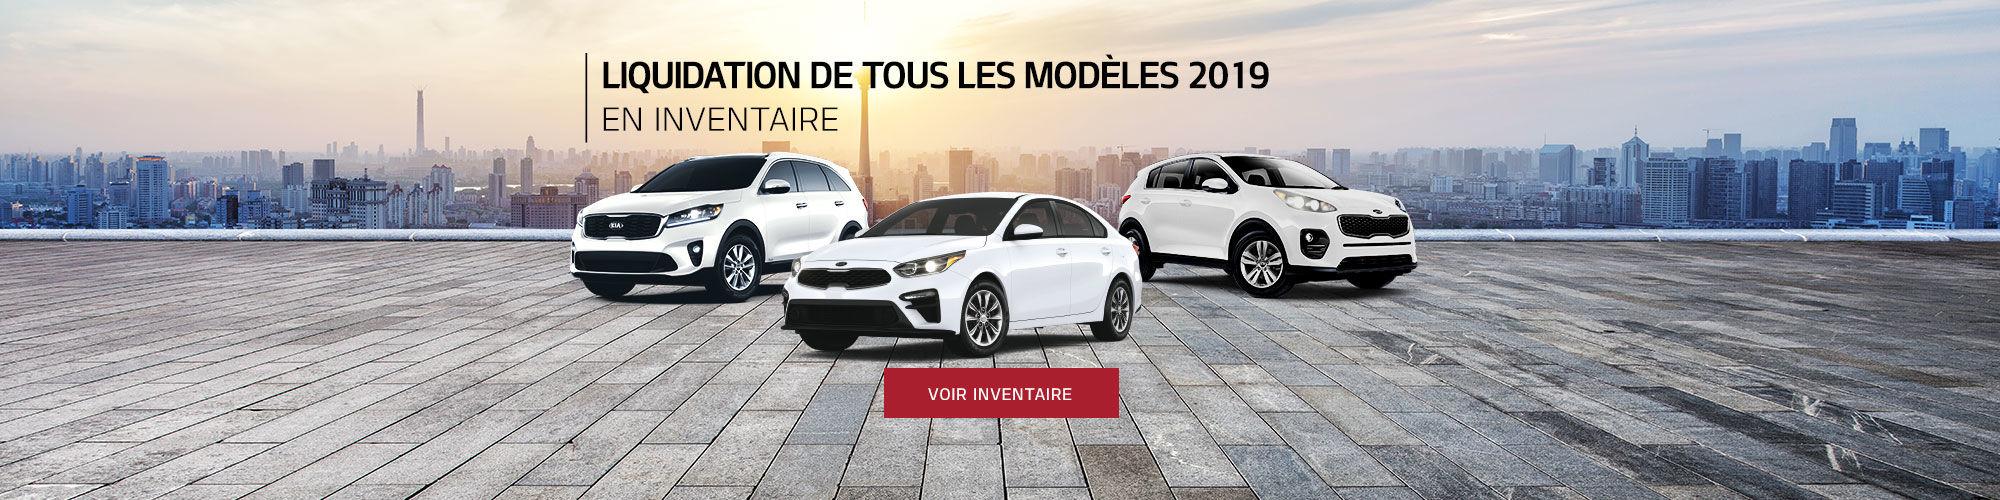 Liquidation modèles Kia 2019